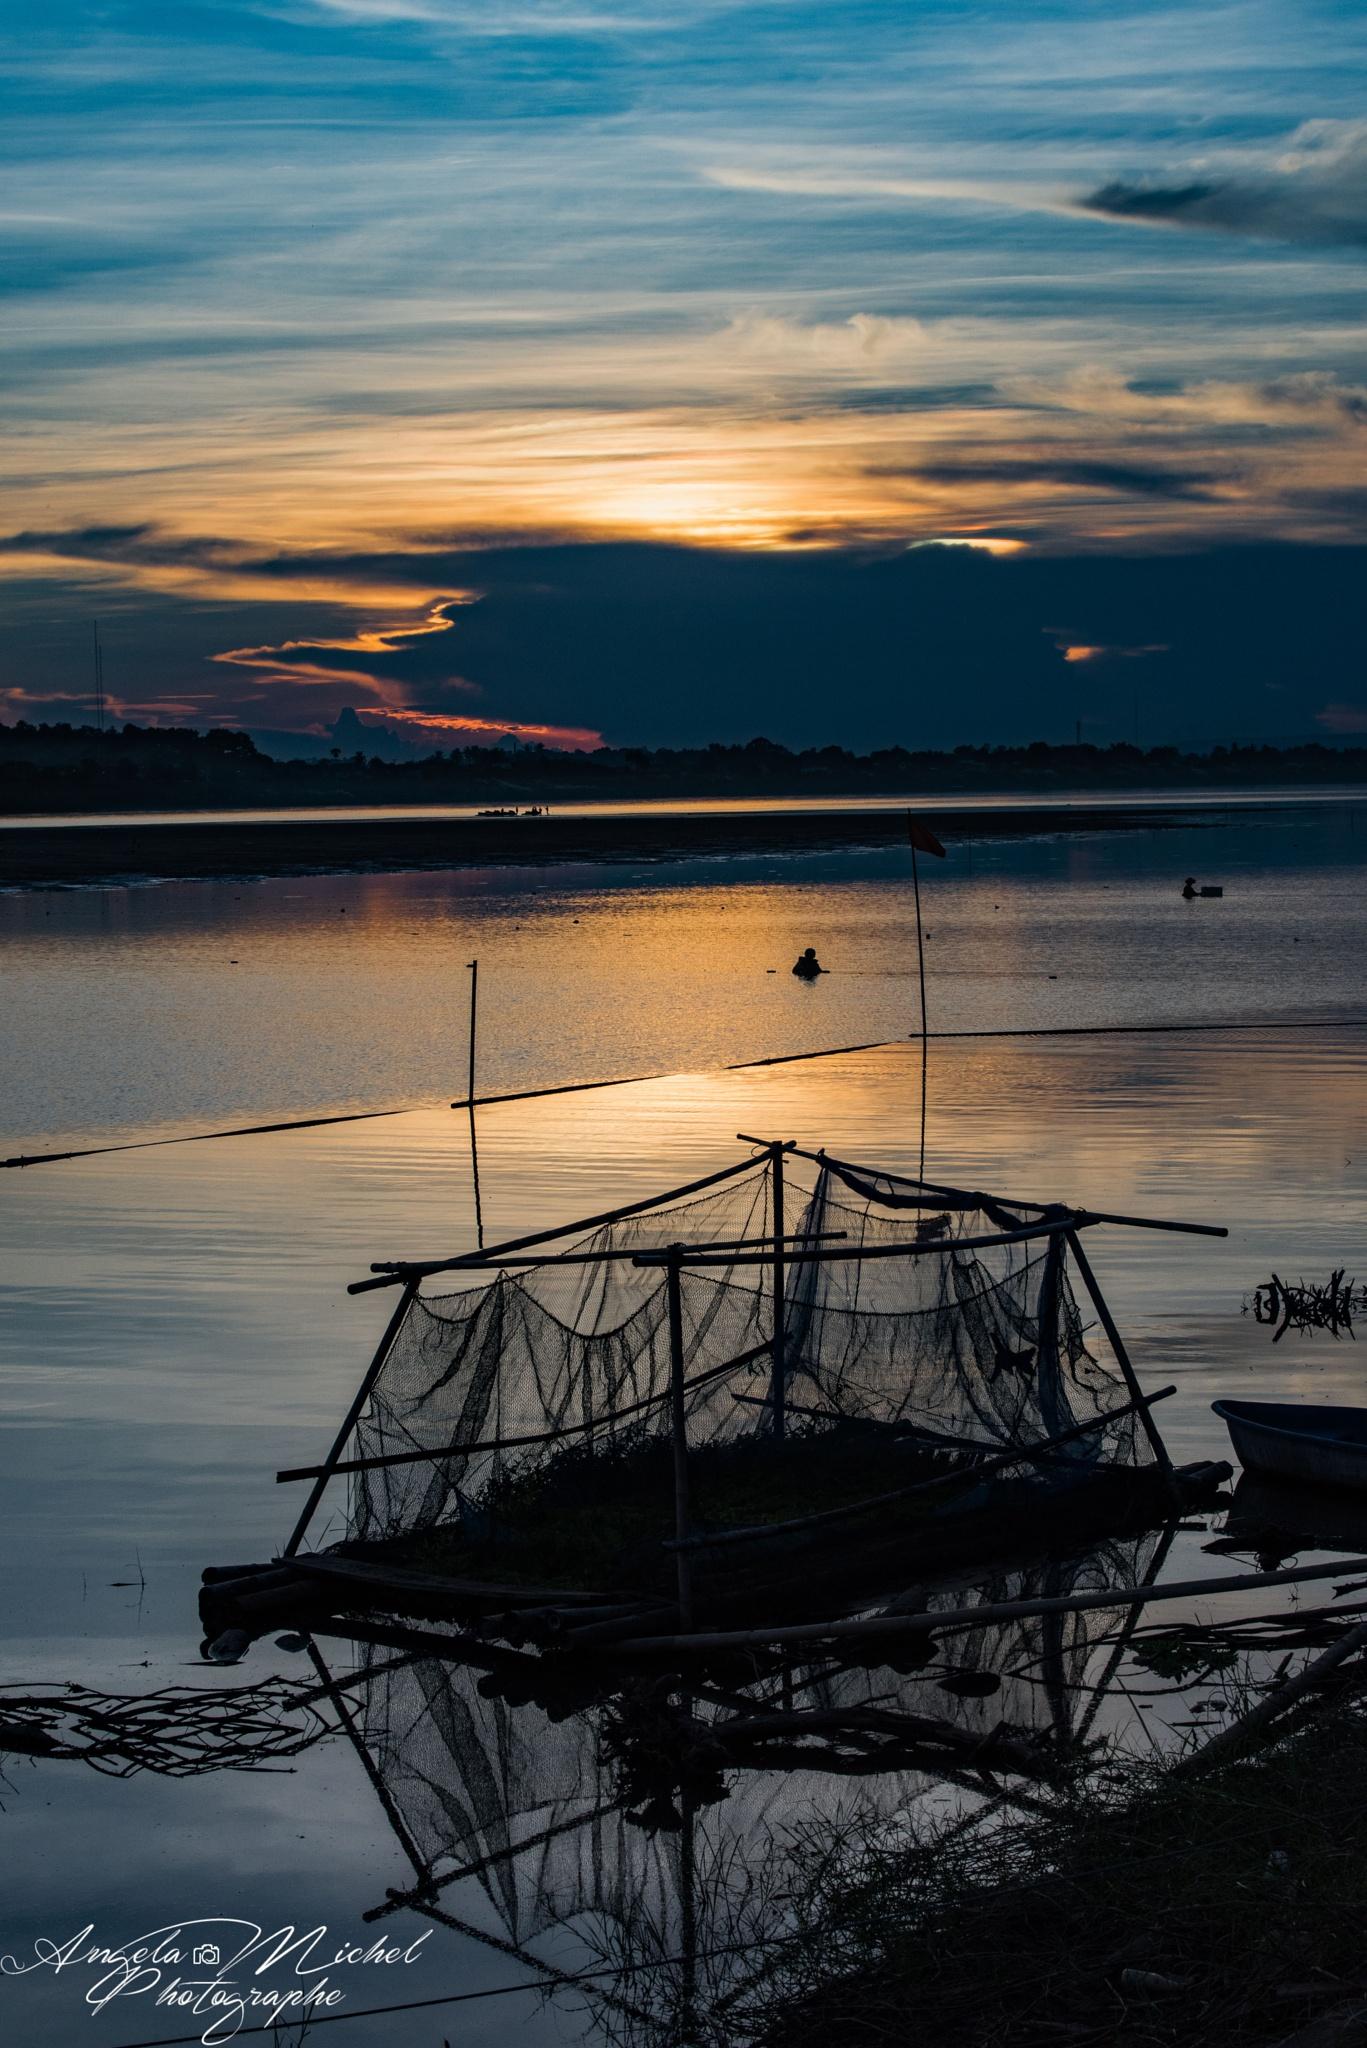 Sunset Mekong  by Angela.michel